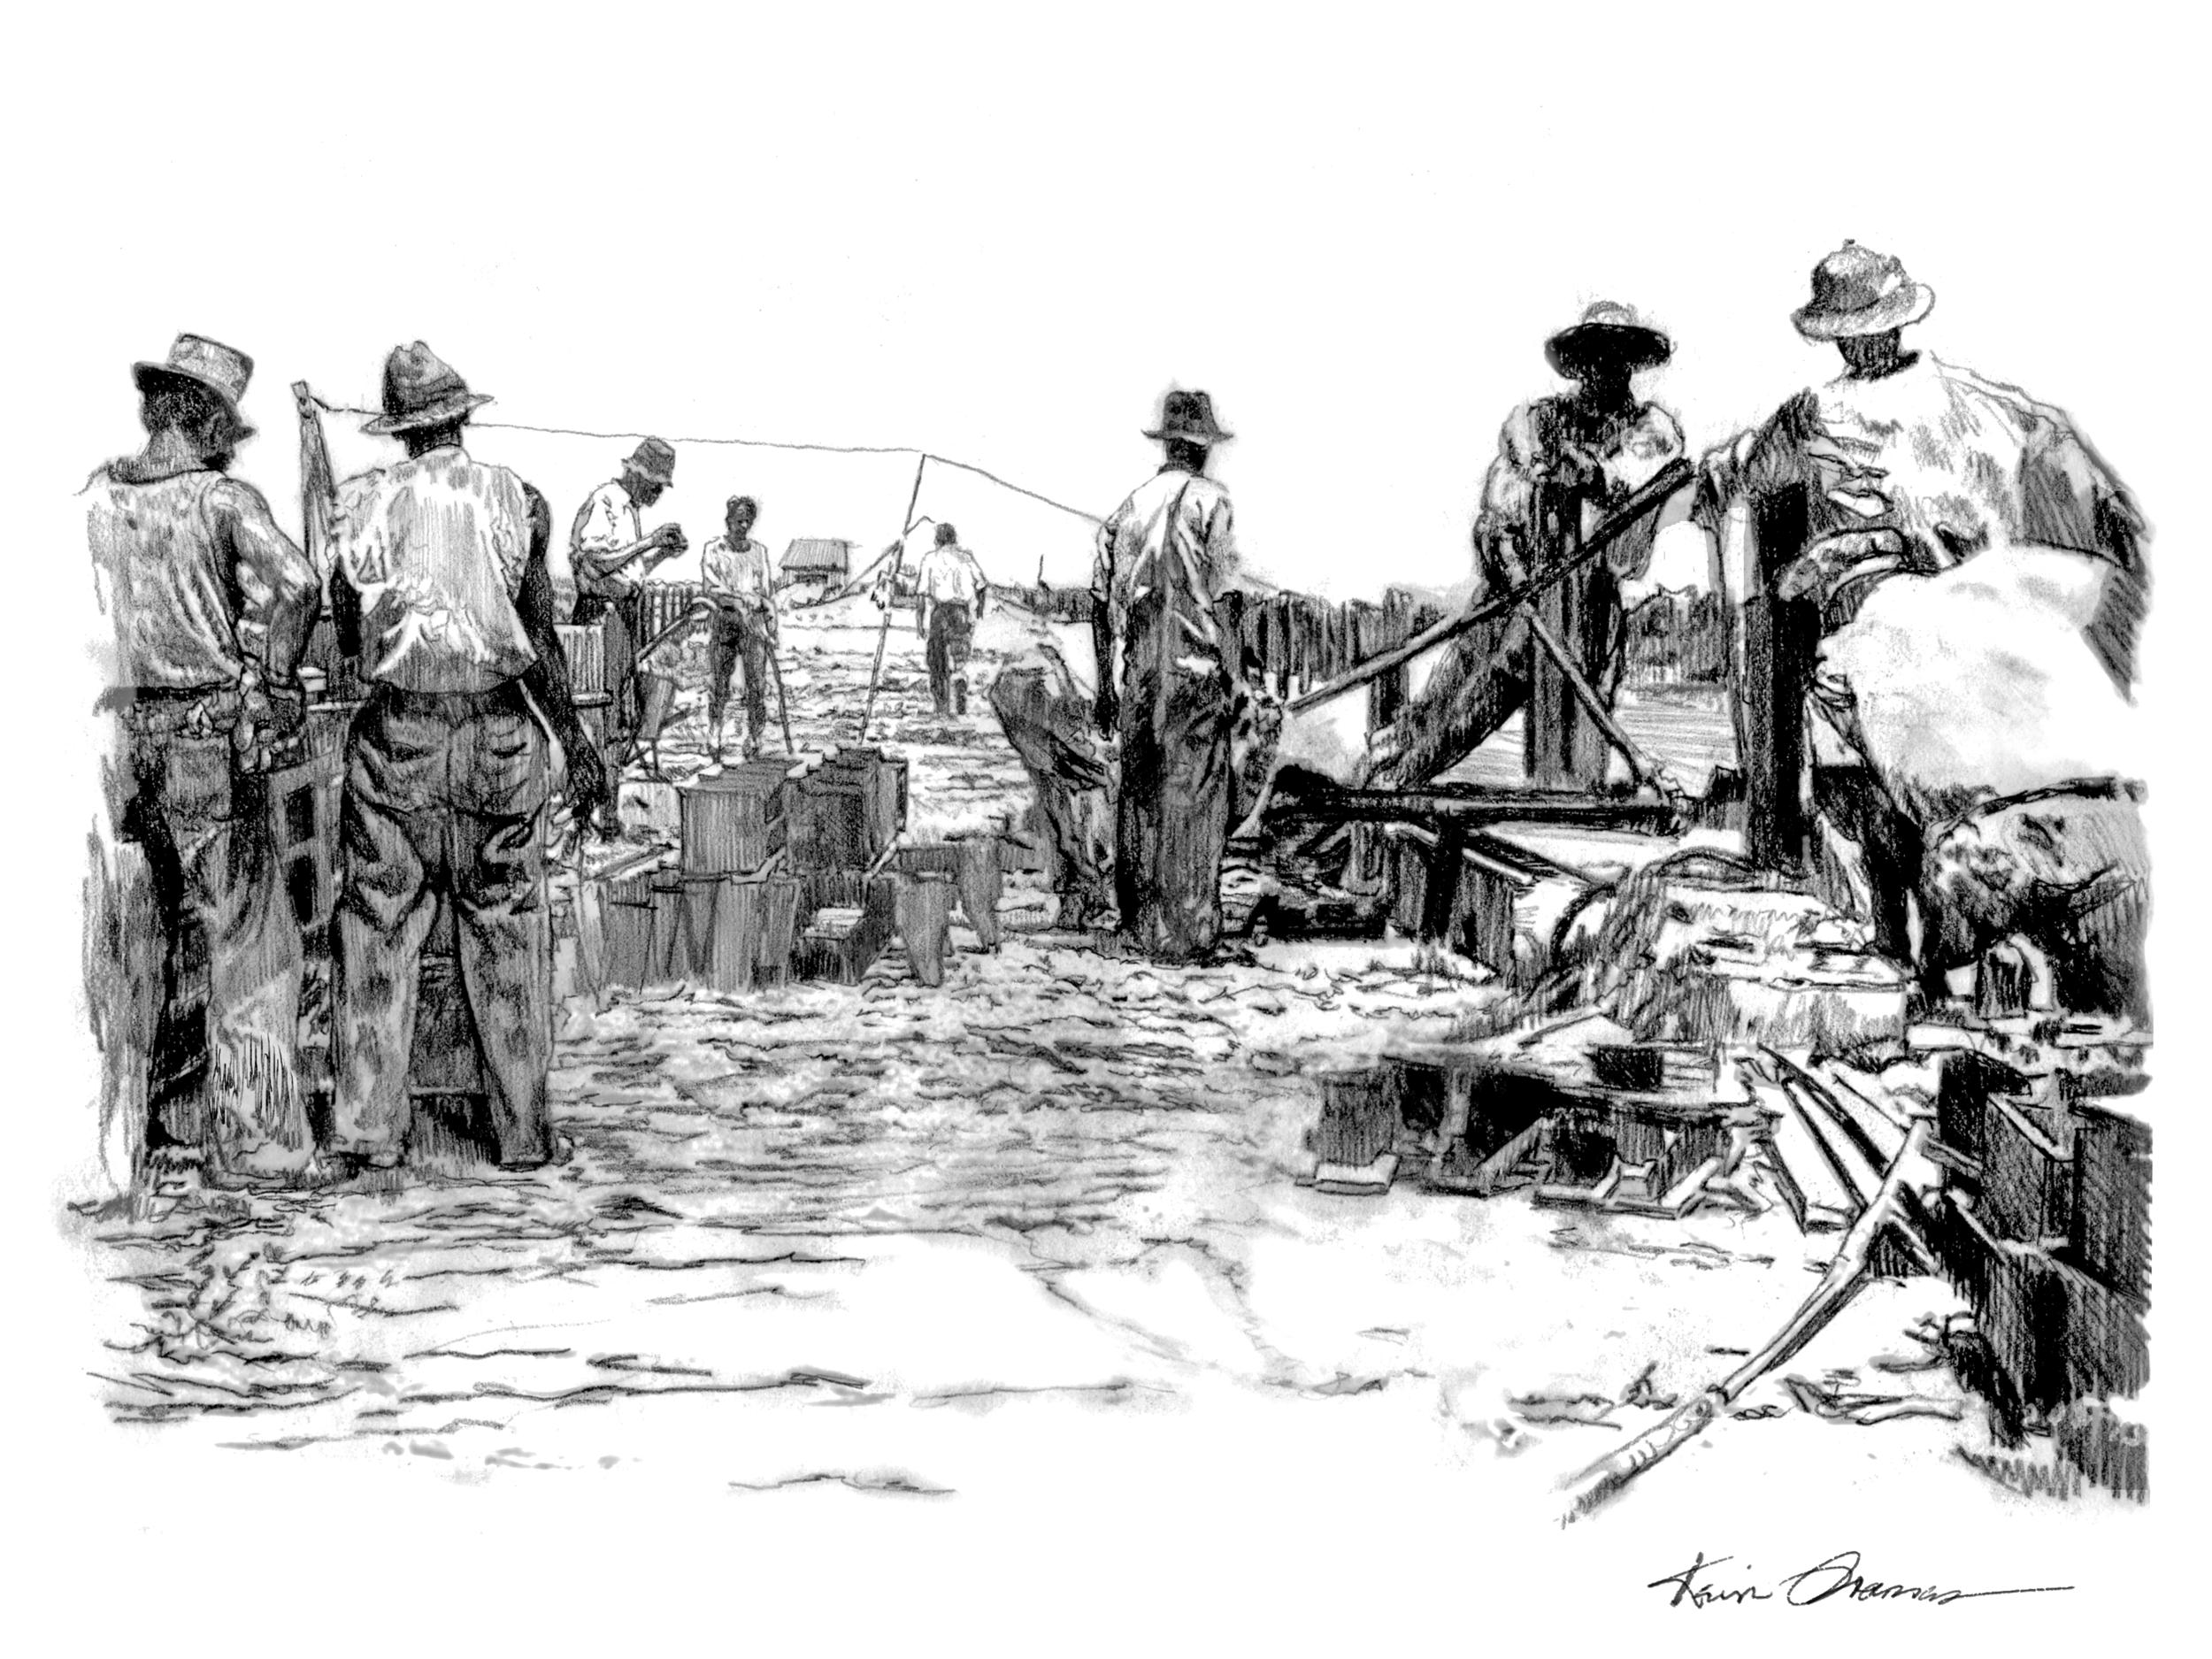 Bahia Honda Railway workers